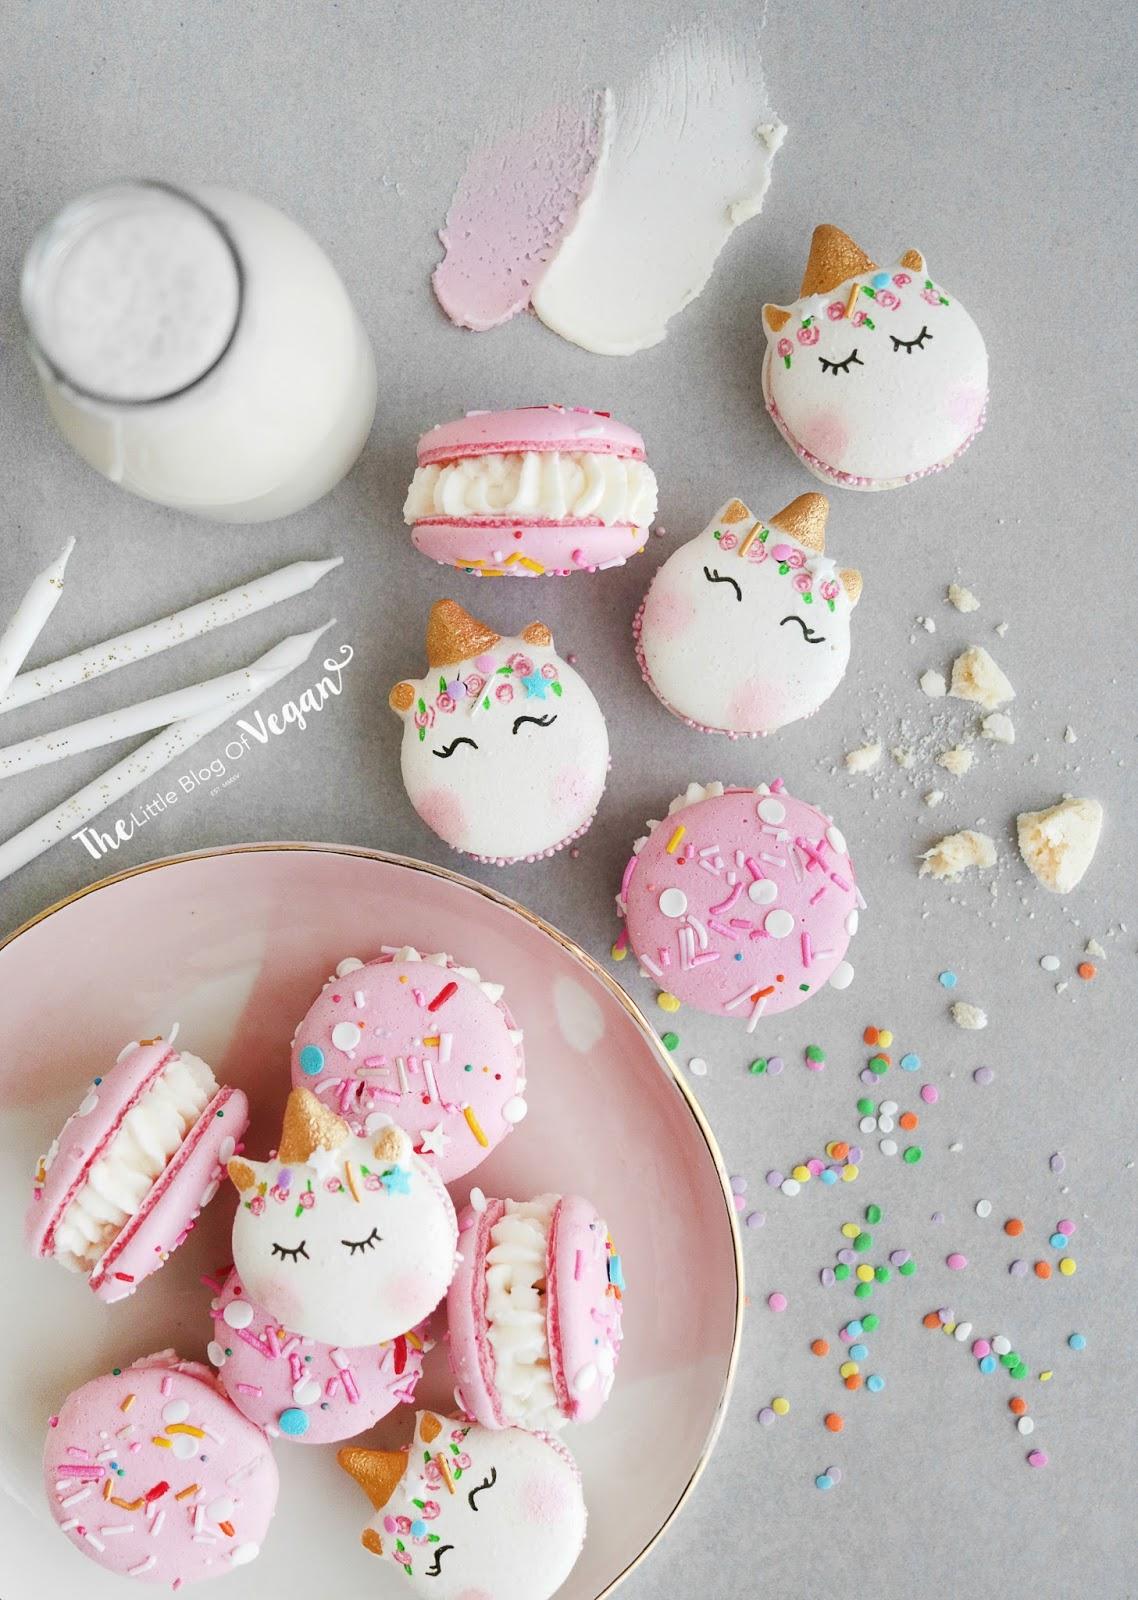 Amazing Unicorn Birthday Cake Macarons Recipe The Little Blog Of Vegan Funny Birthday Cards Online Elaedamsfinfo